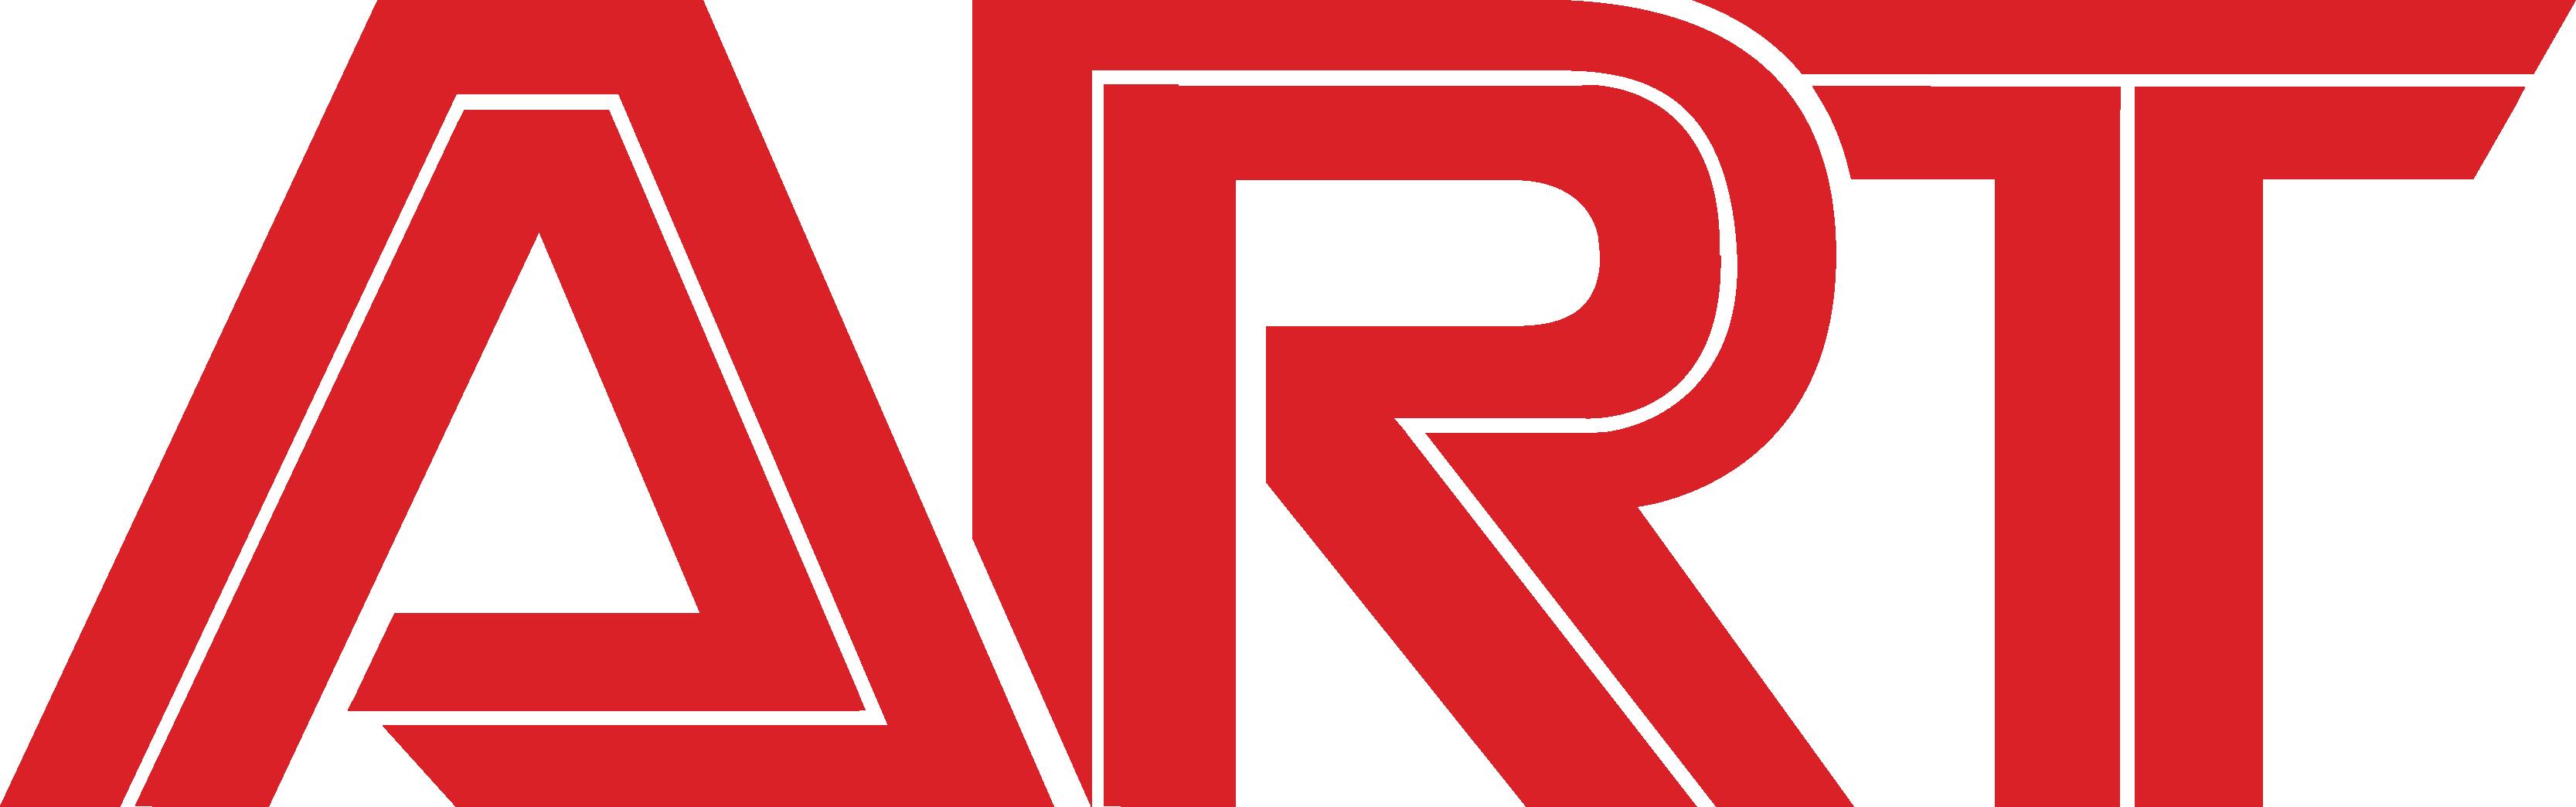 File:ART Television (Sri Lanka) (logo).png.